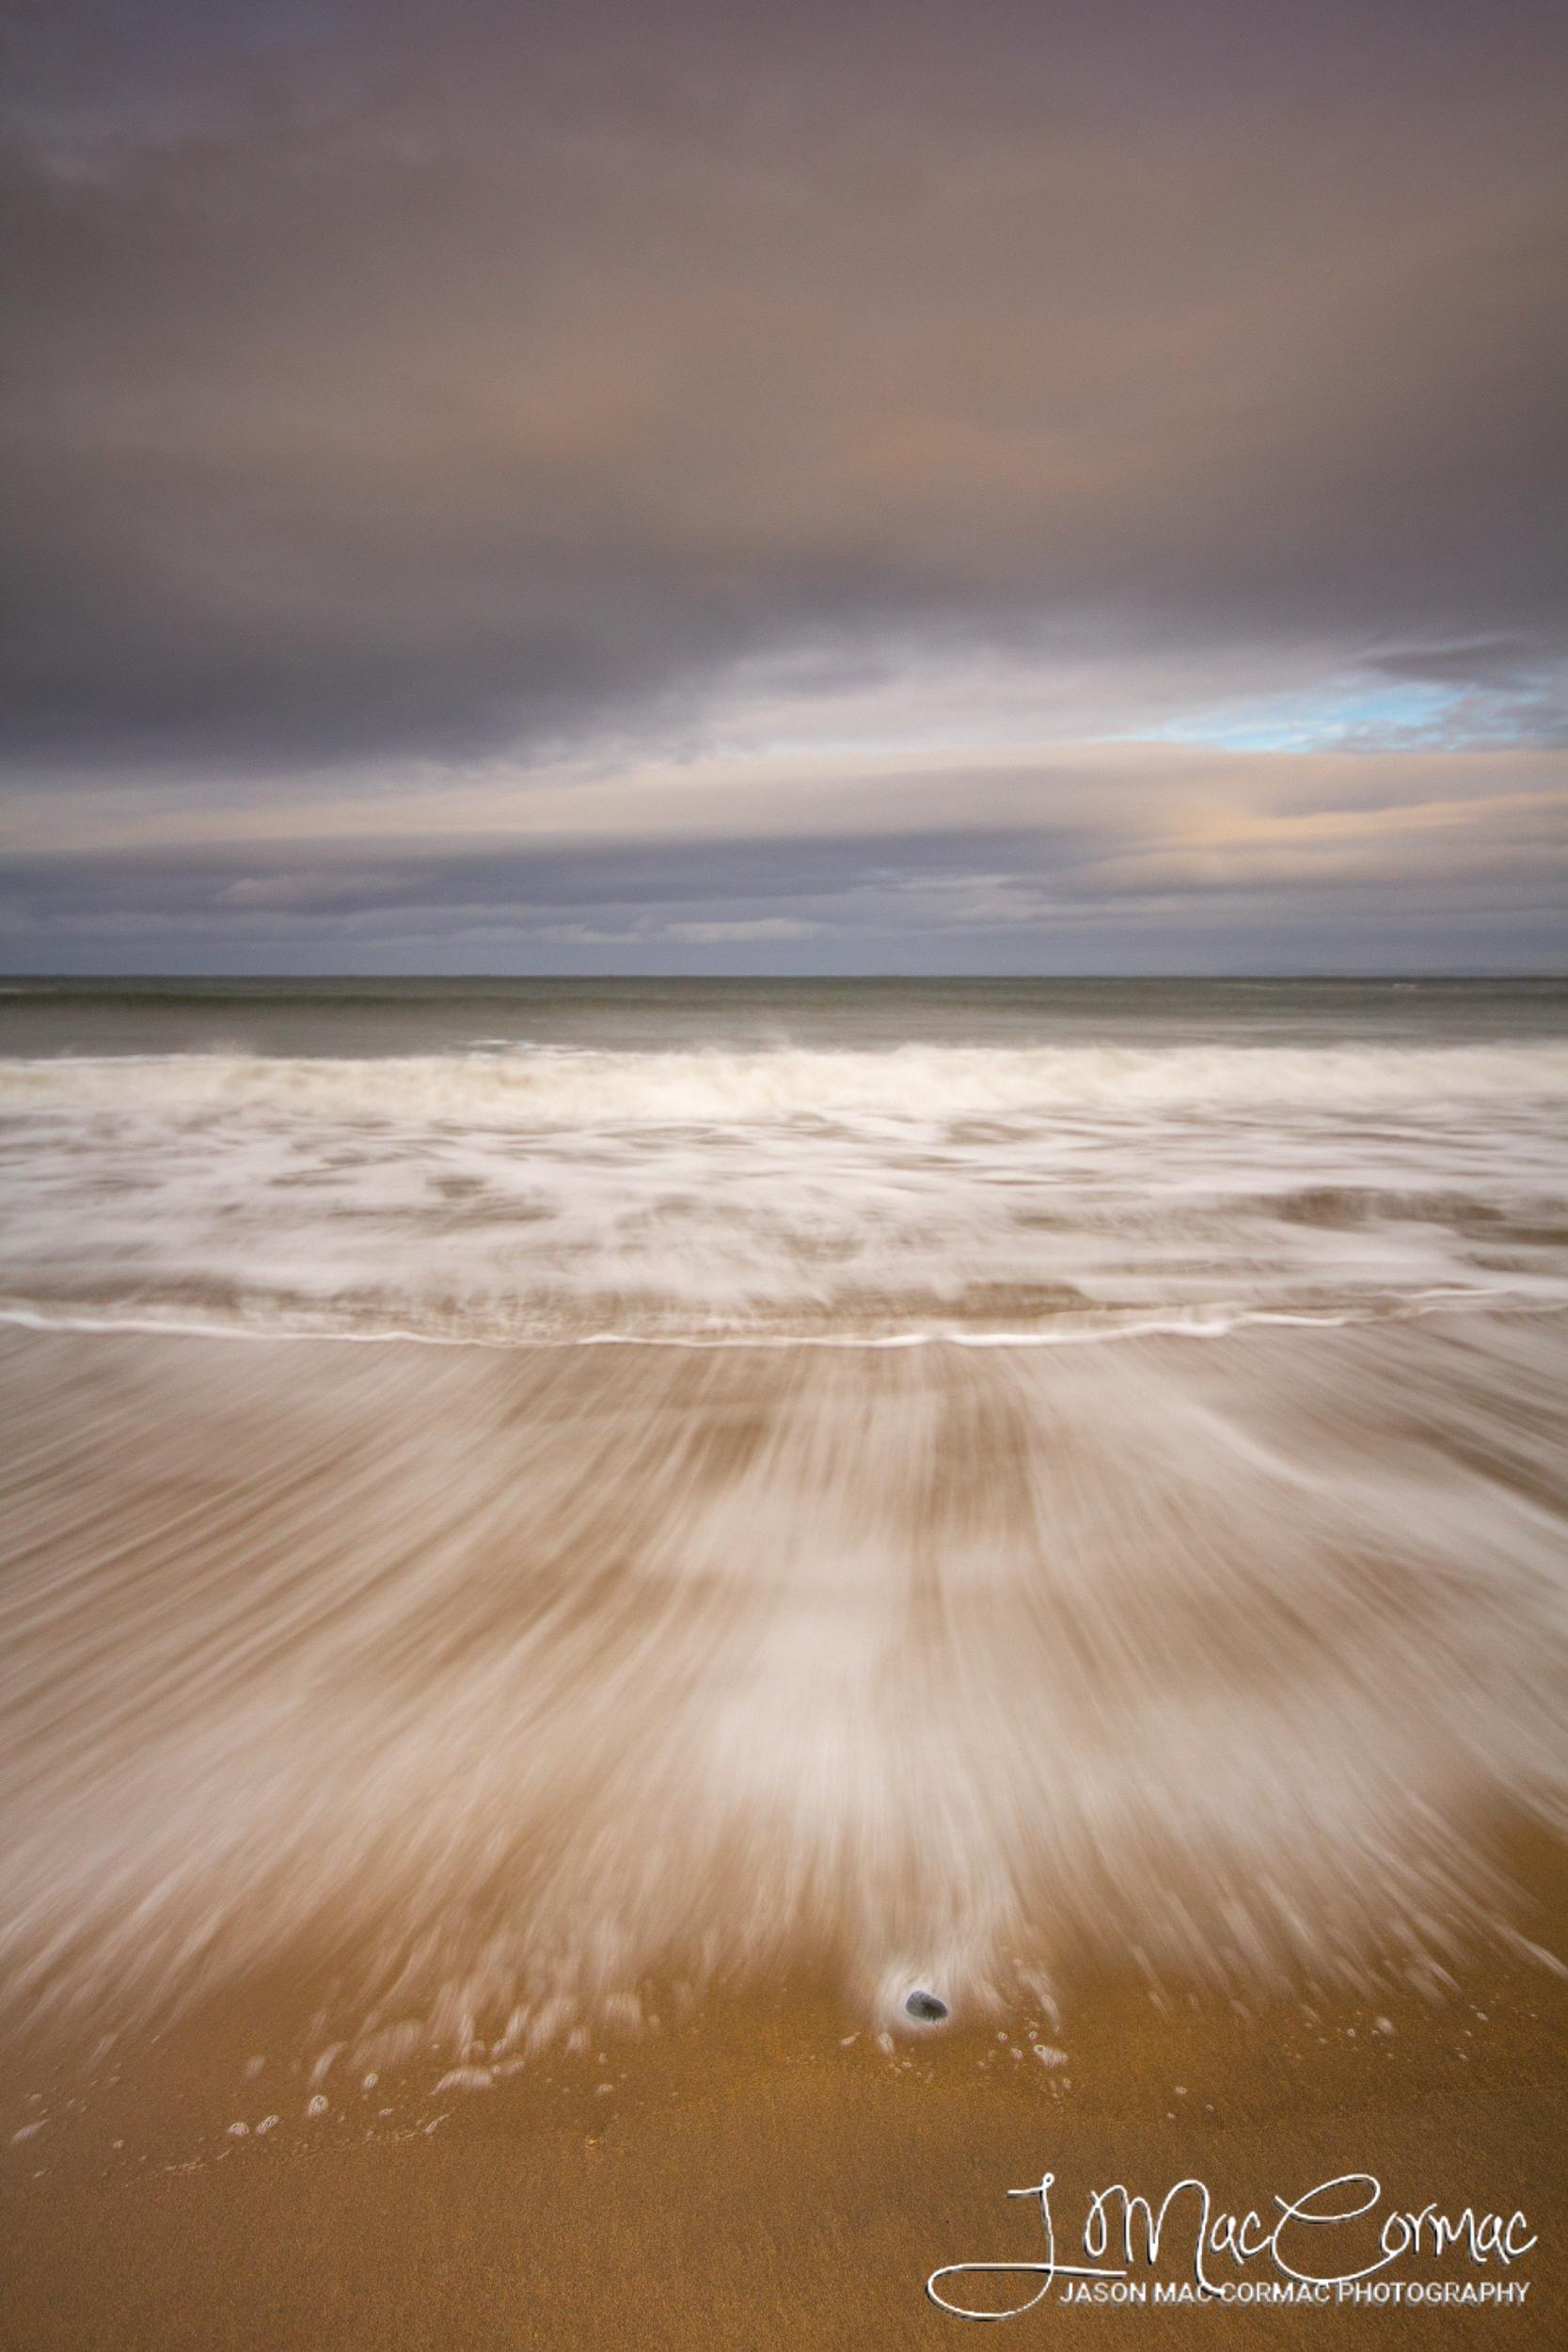 Rough seas on the West Coast